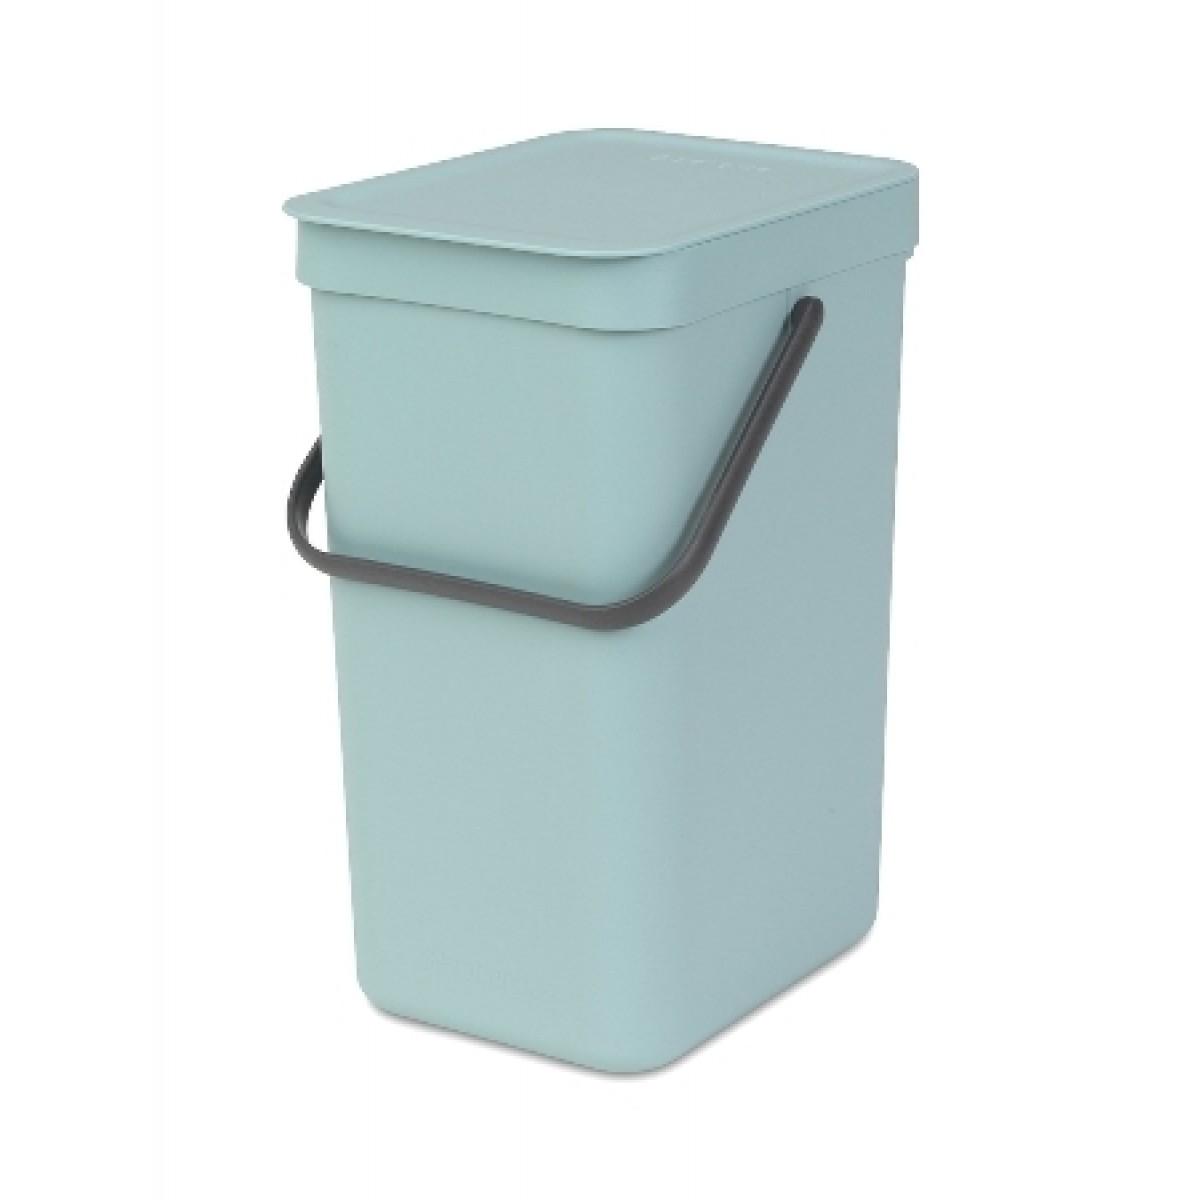 BRABANTIA Affaldsspand m/ låg - Affaldssortering 12 ltr - mint